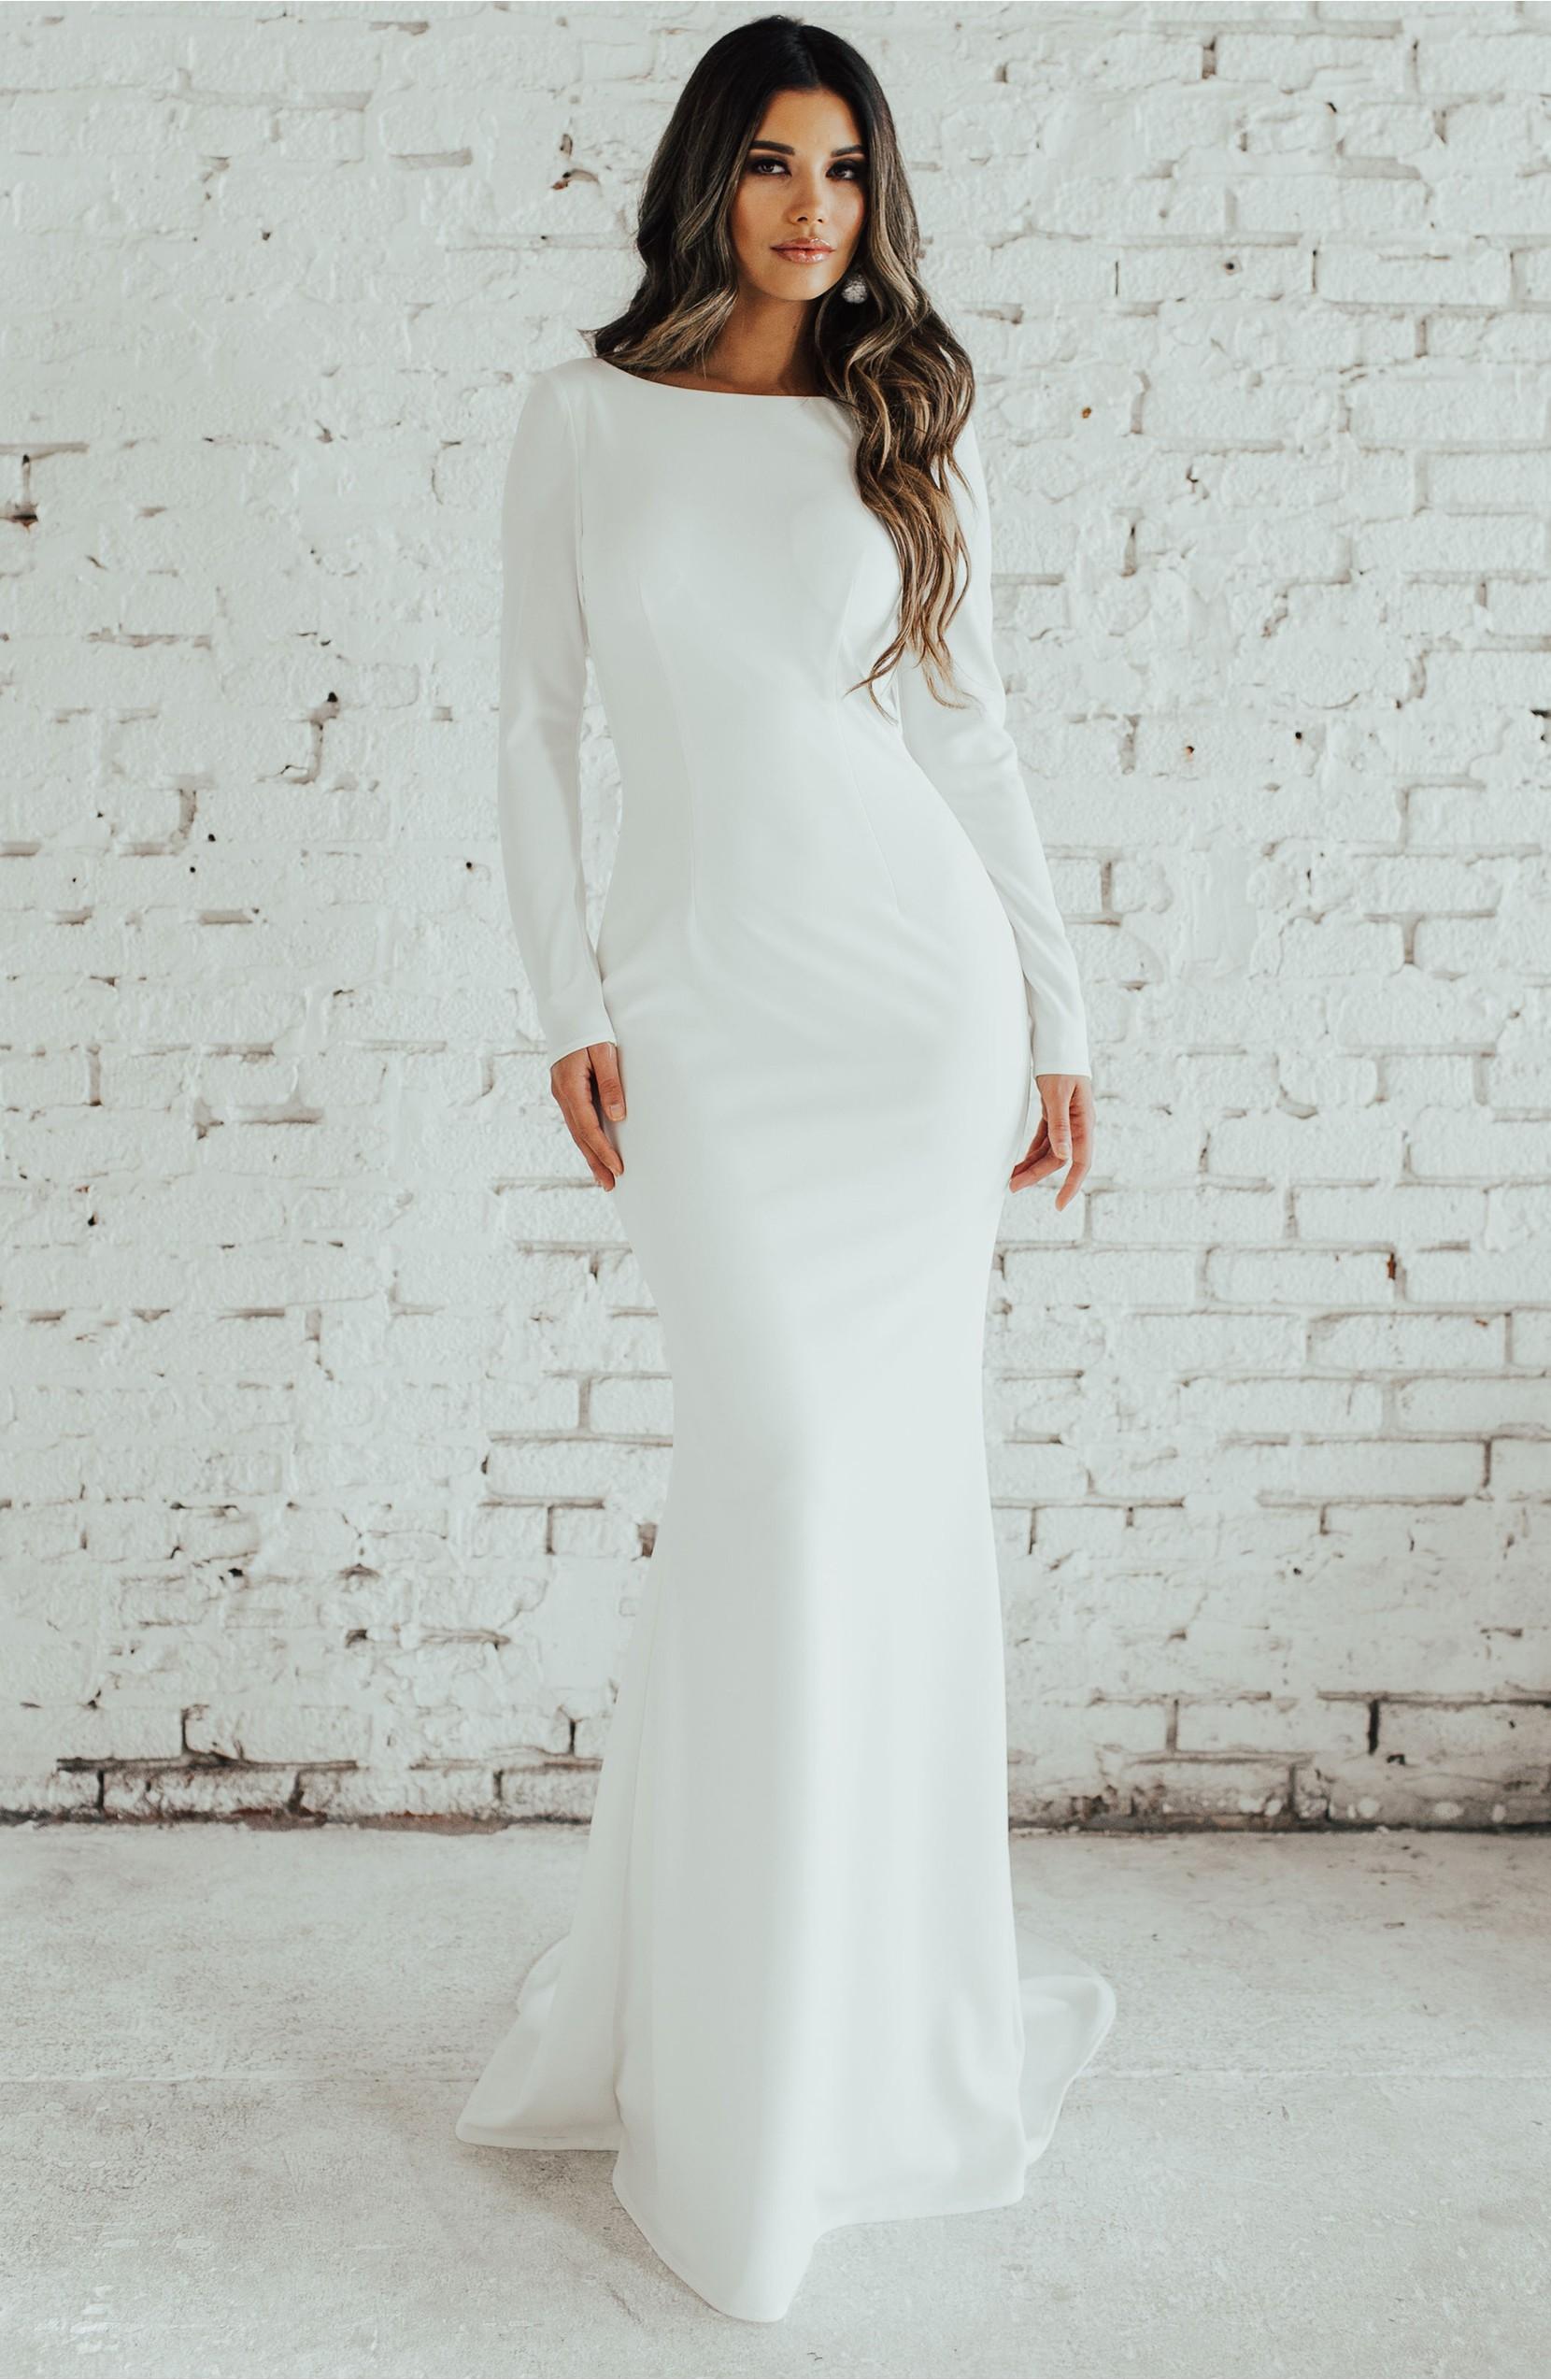 Cowl Back Wedding Dress